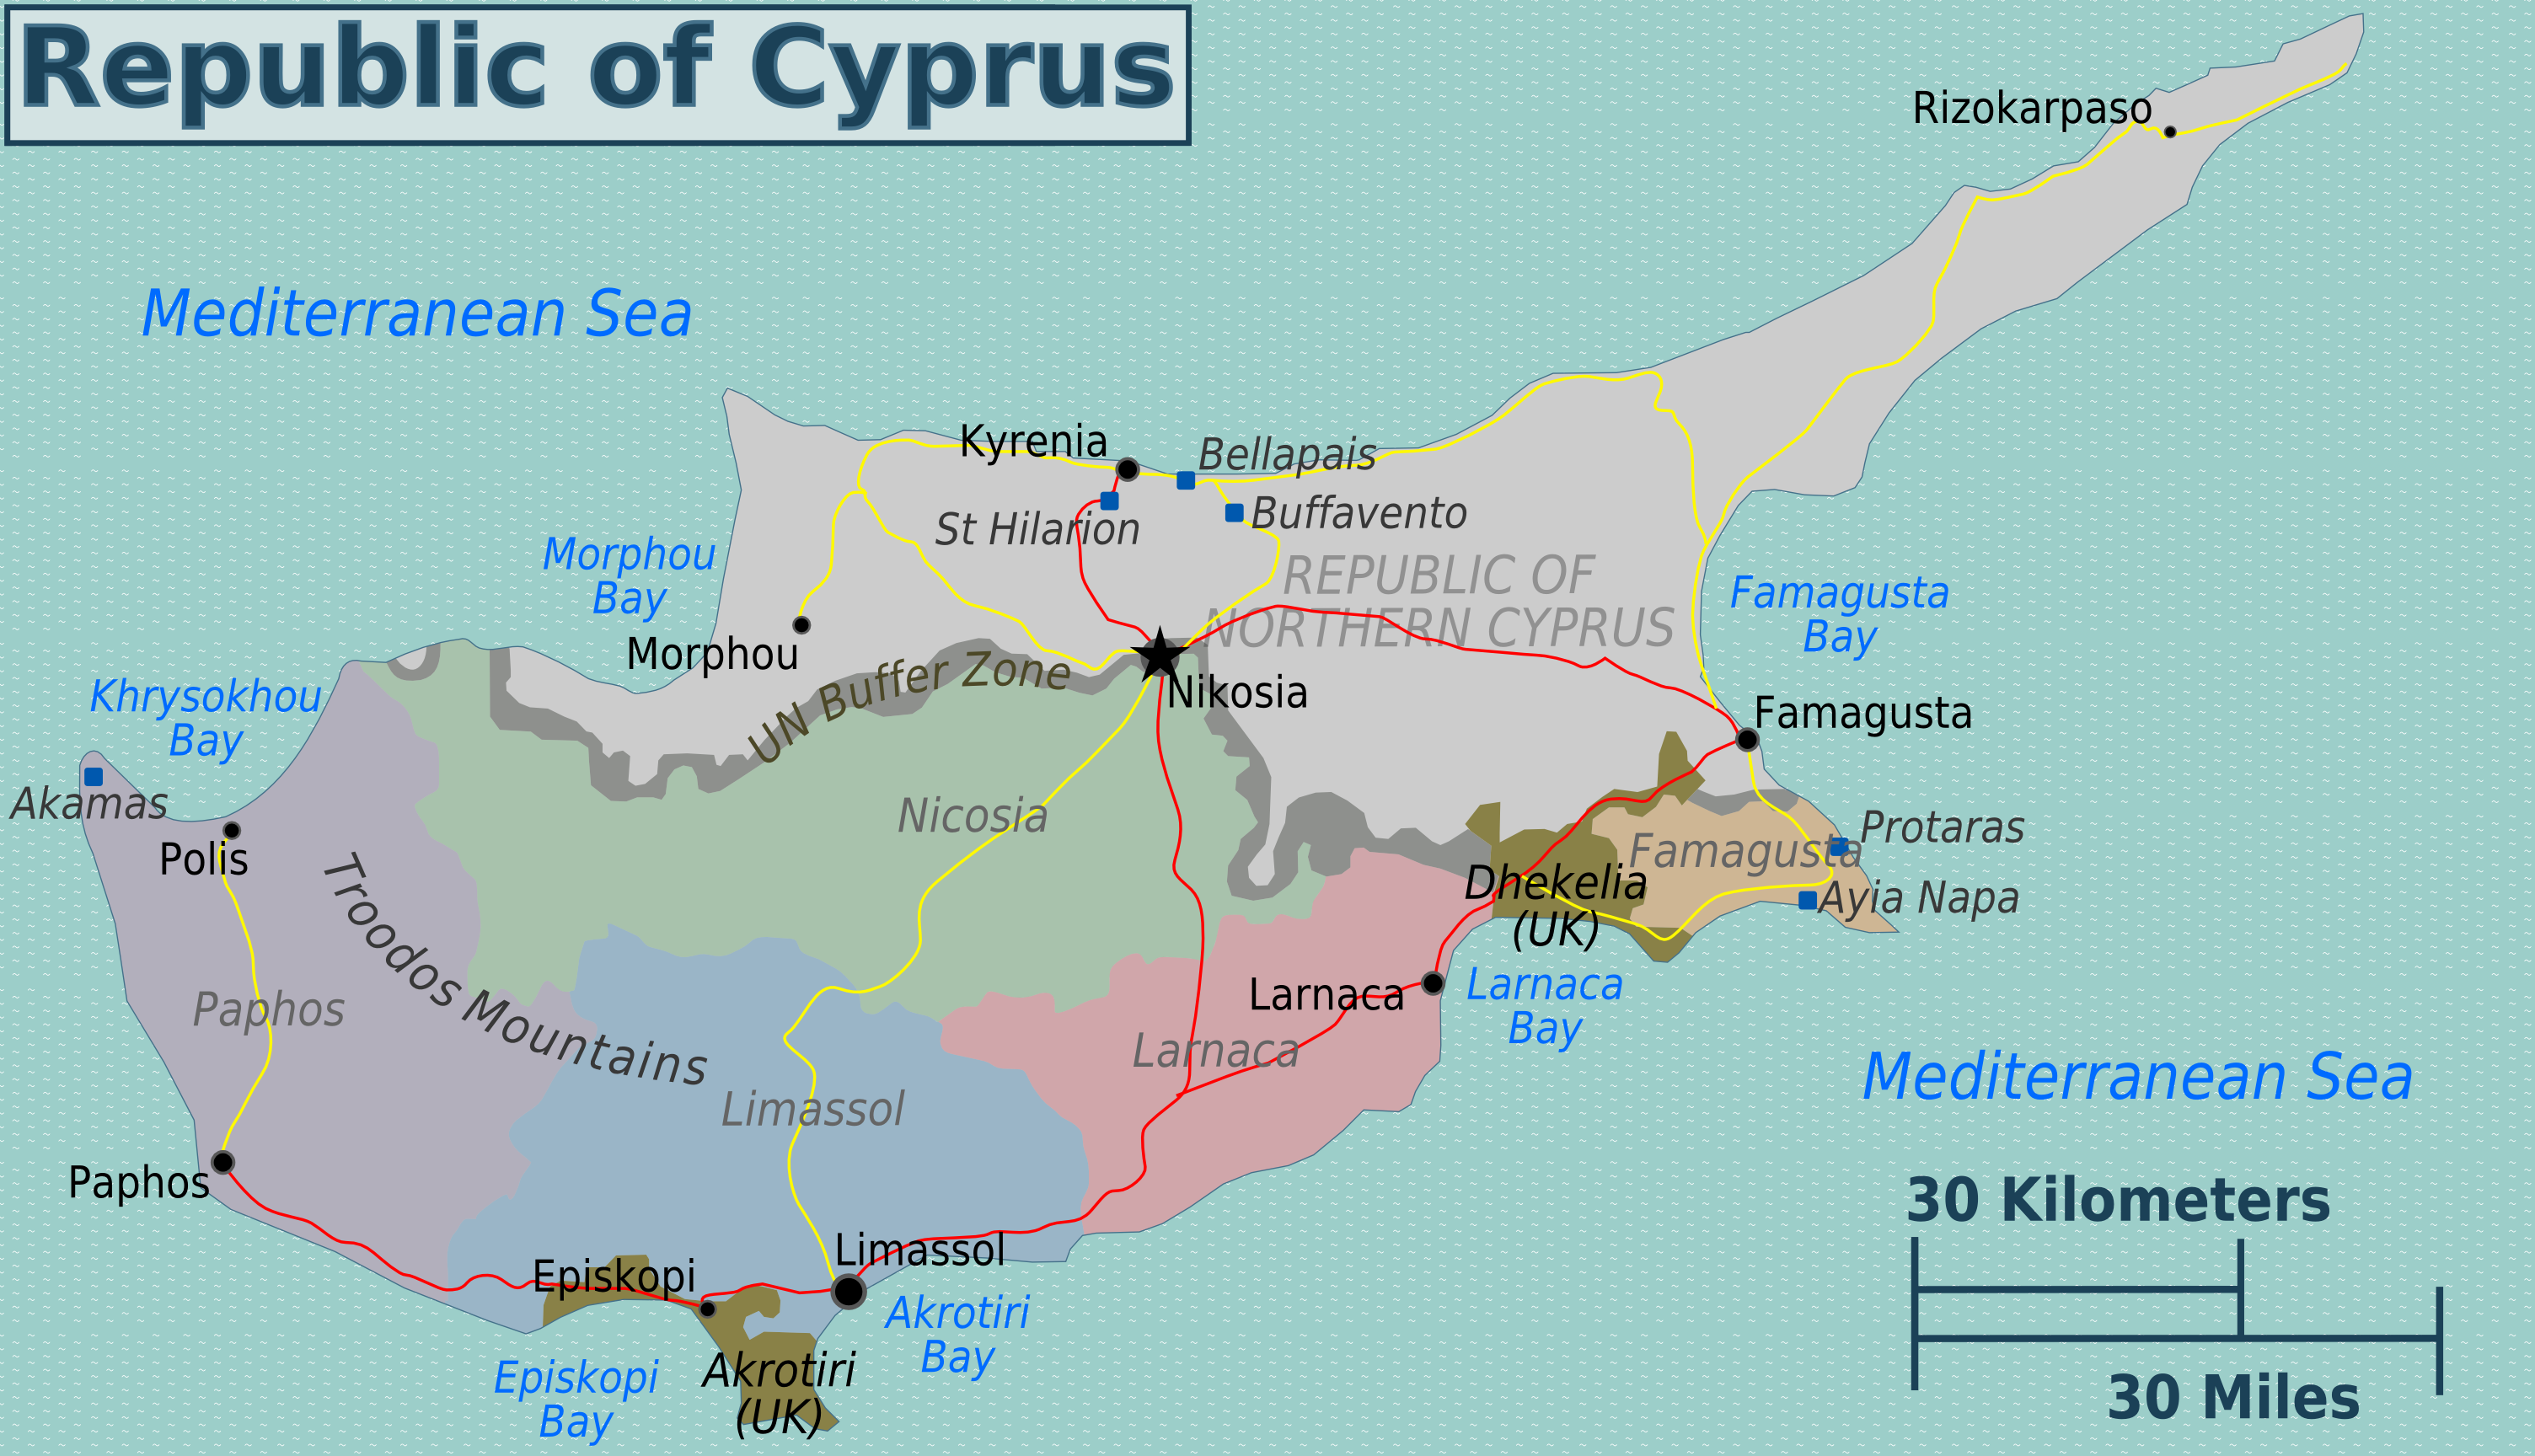 landkarte zypern zypern regionen   Weltatlas landkarte zypern